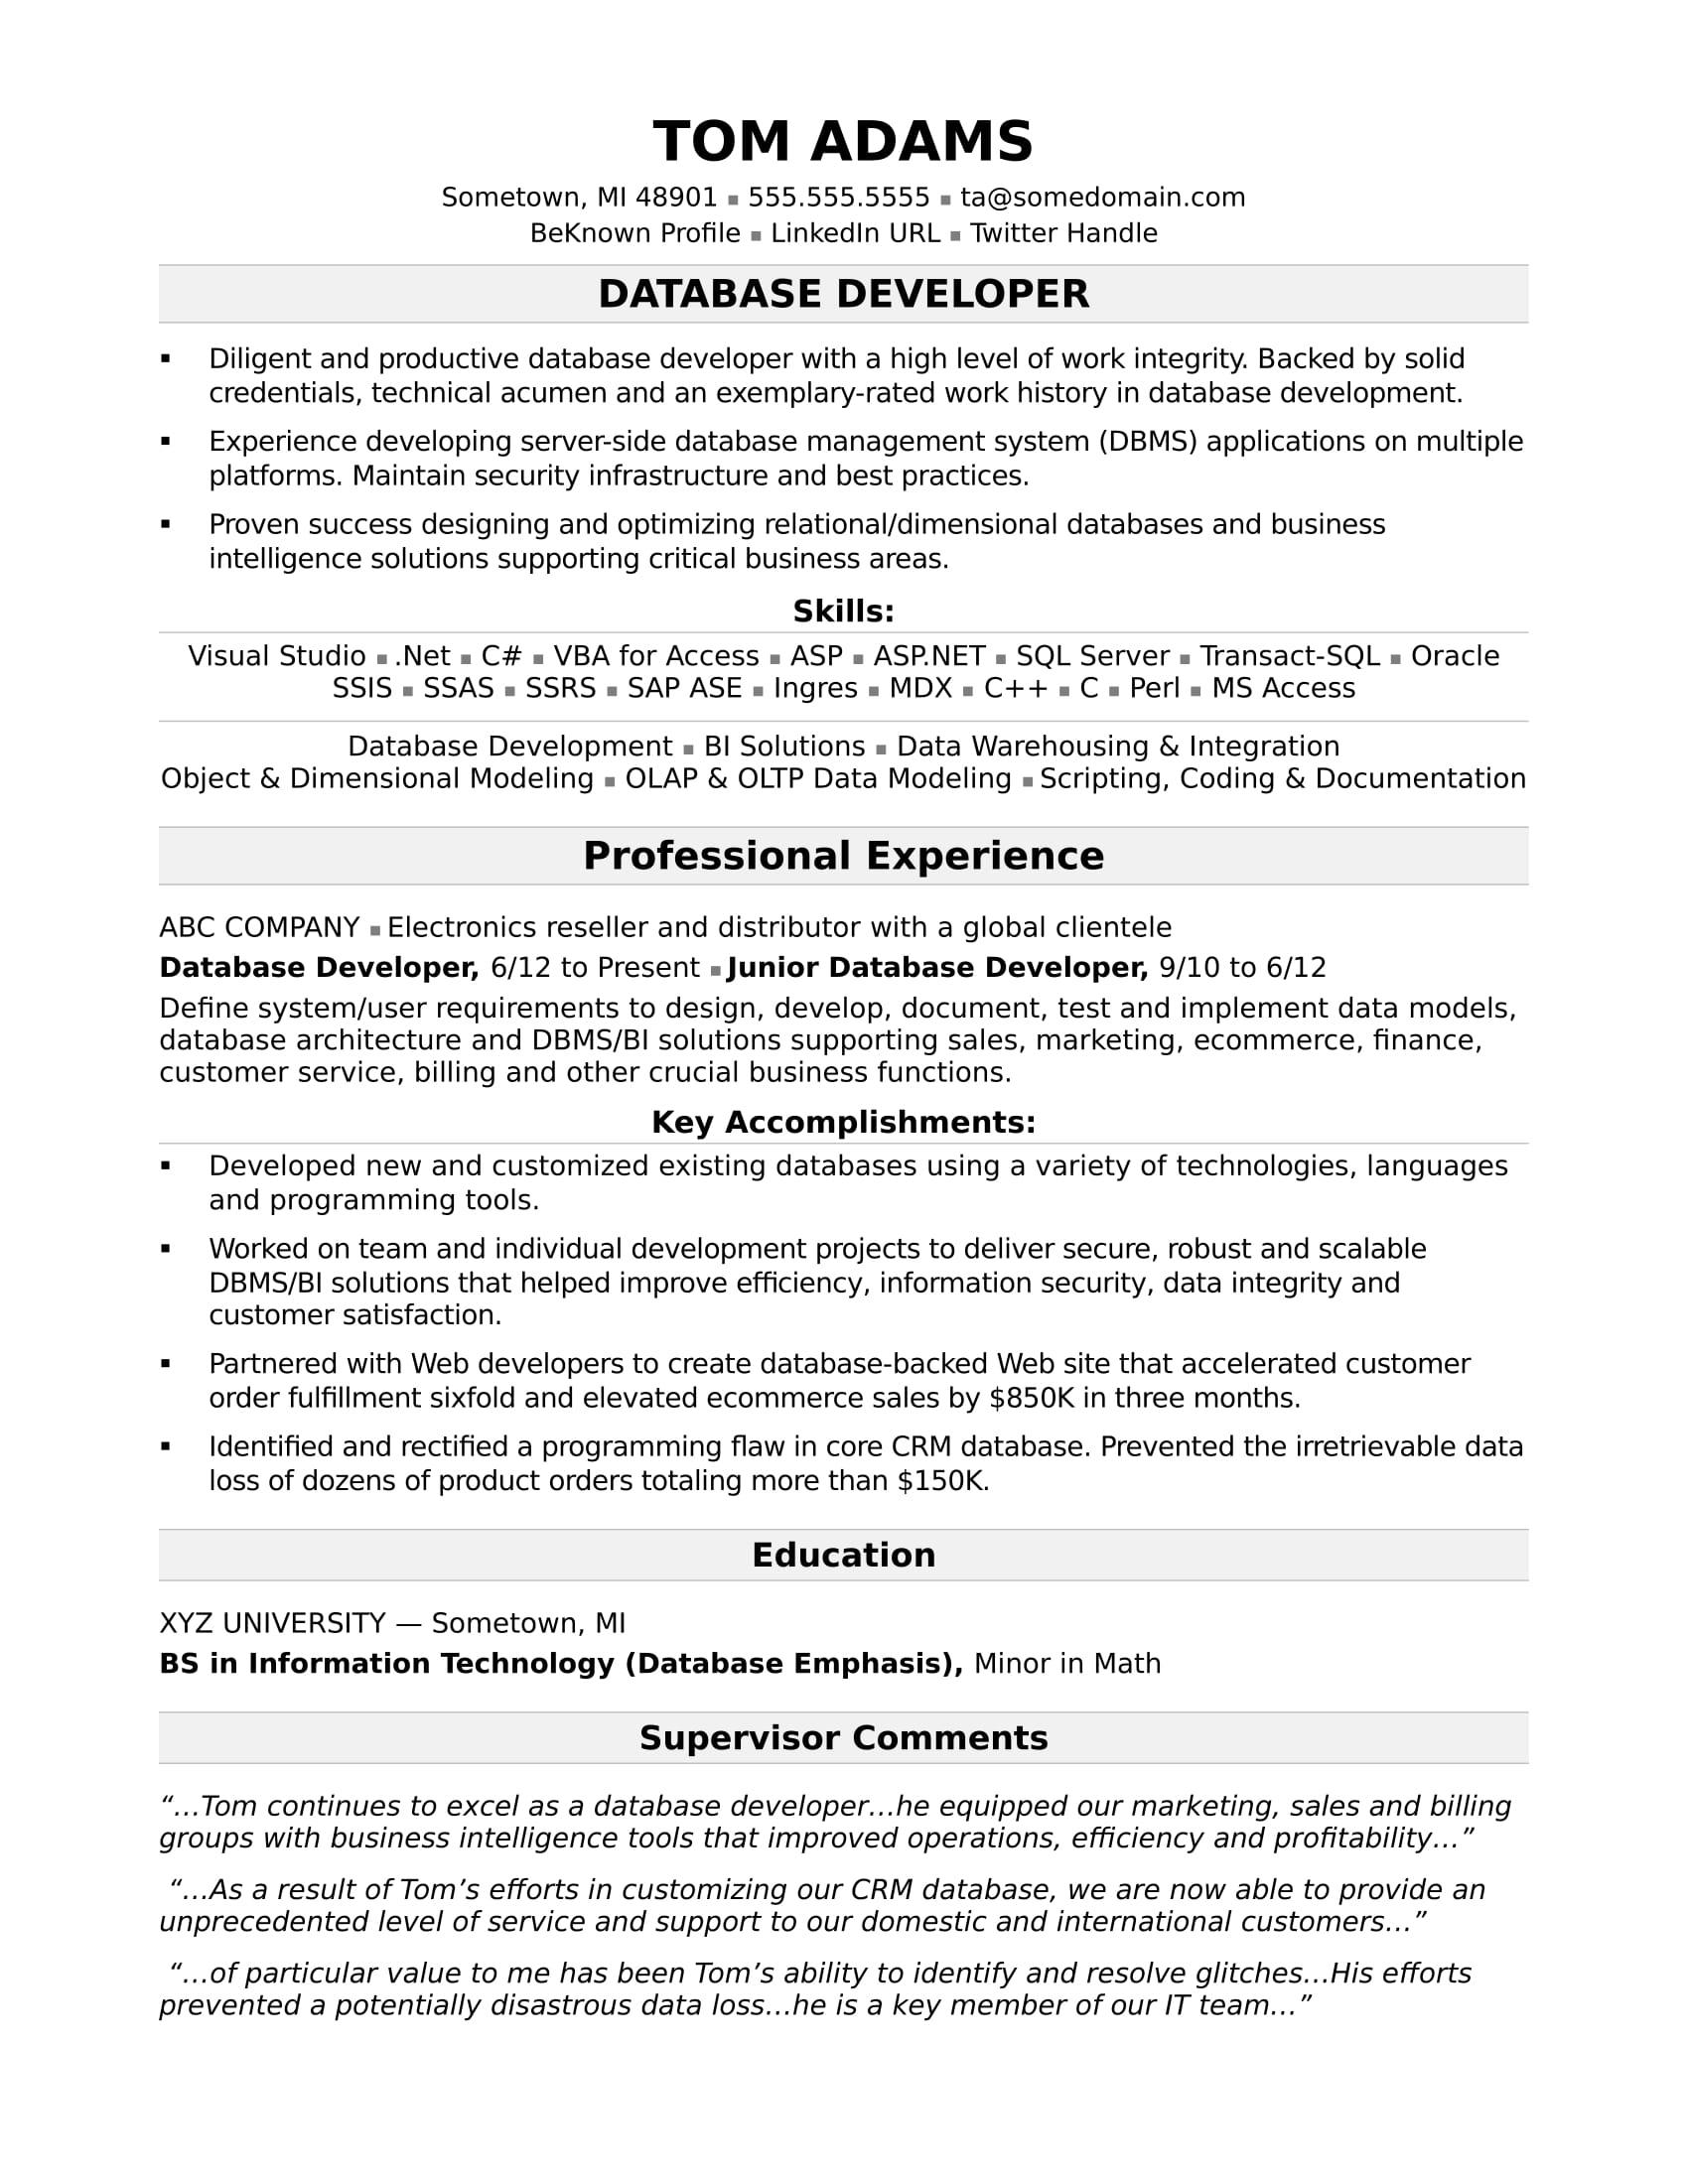 sample resumes in development